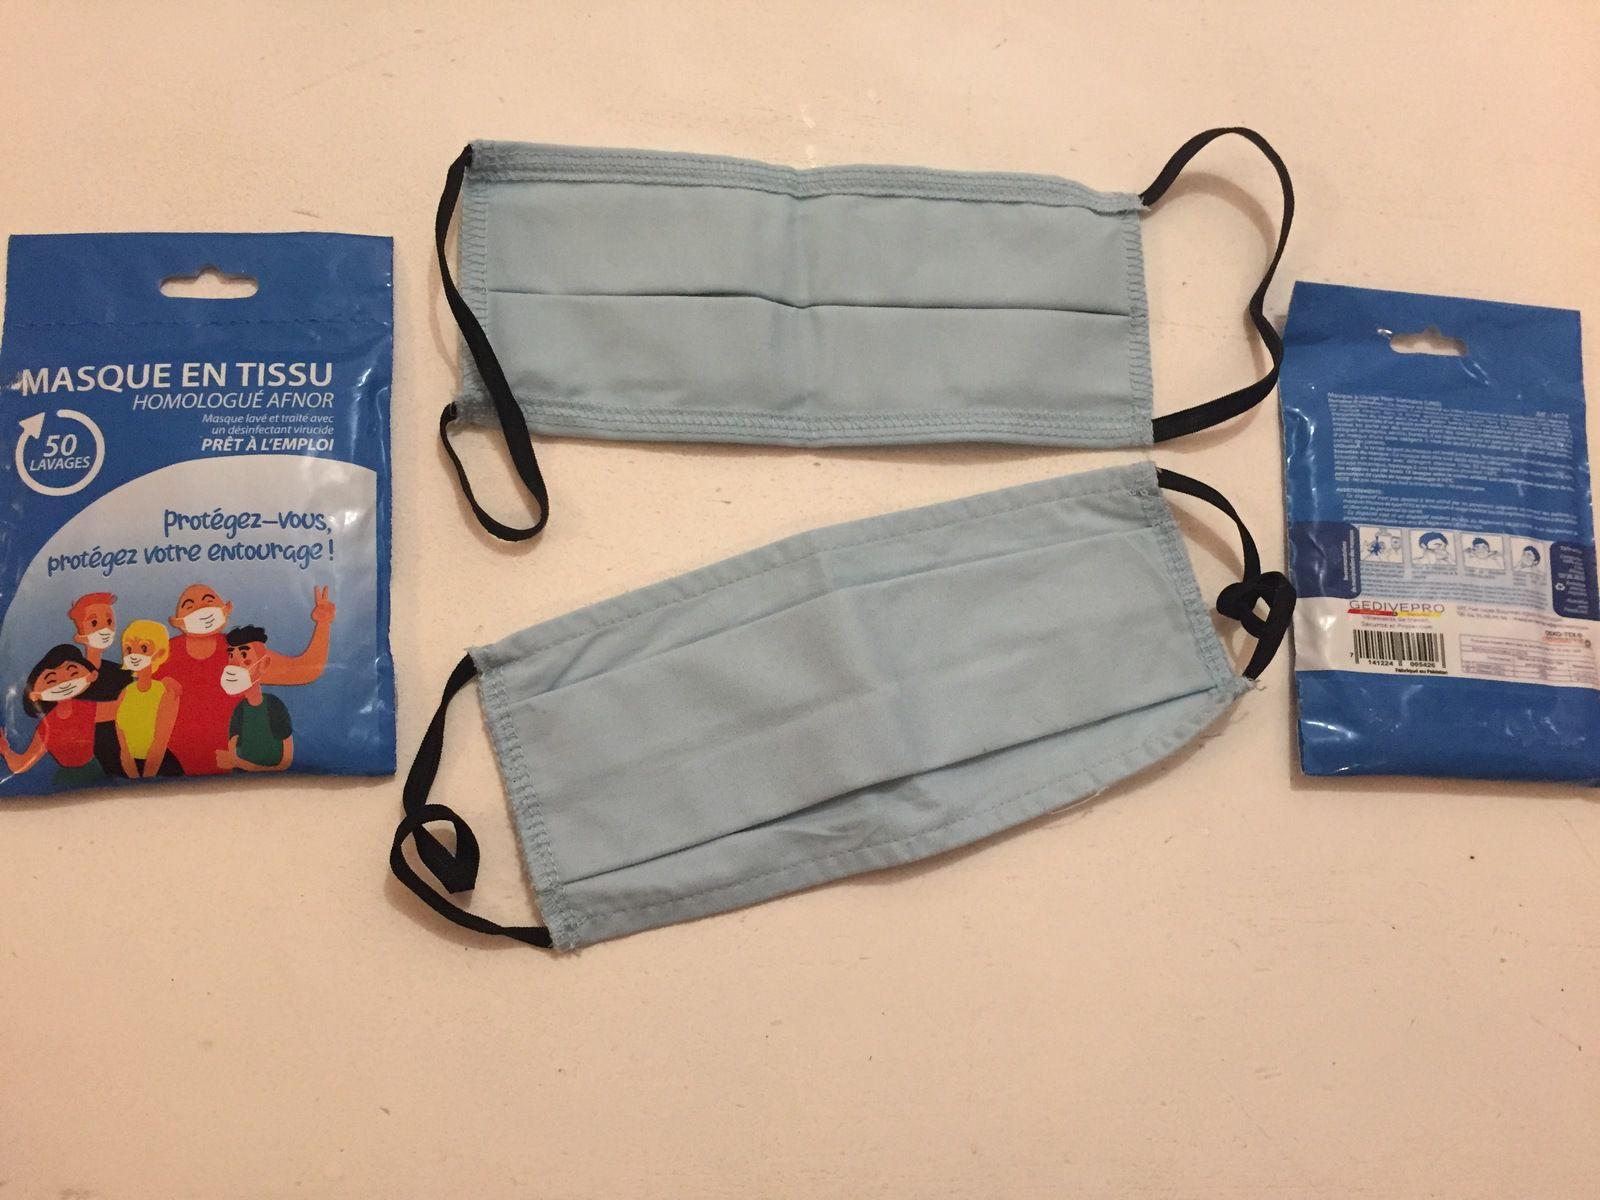 masque en tissu anti covid offert par la ville